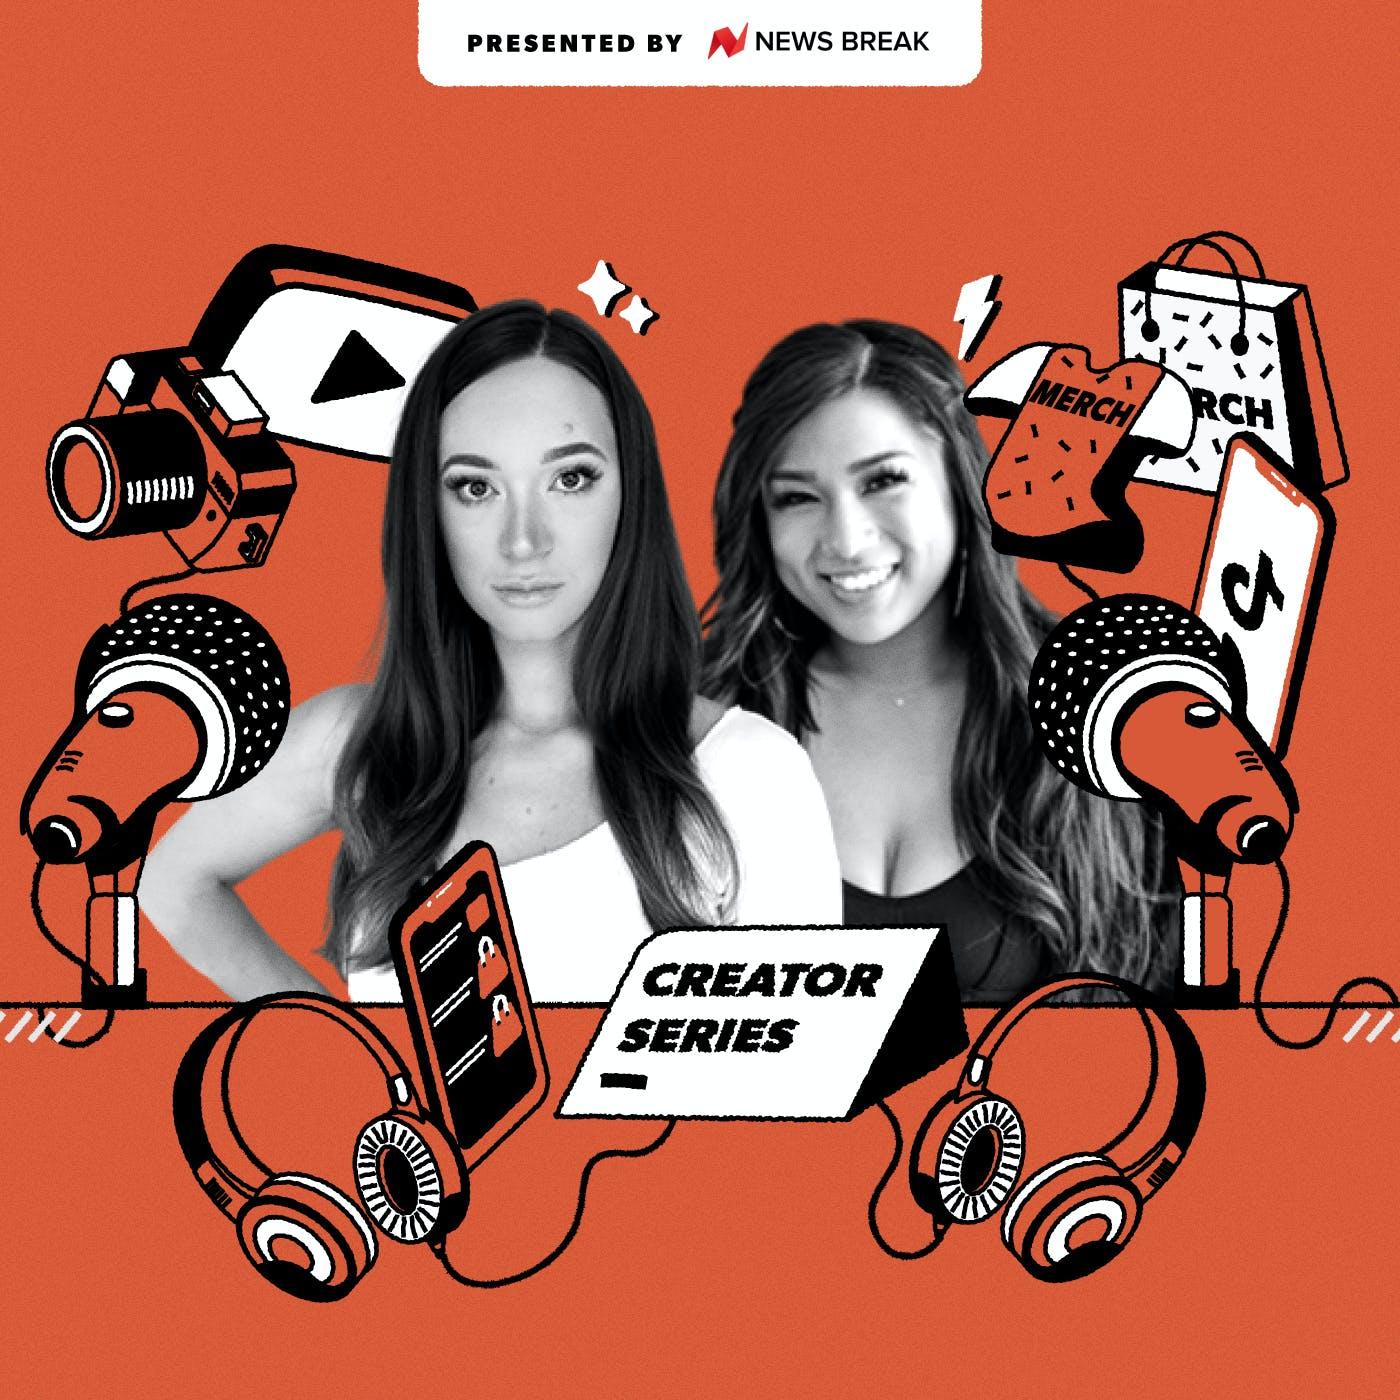 YouTube stars Alisha Marie and Remi Cruz show how creators have become their own class of media company